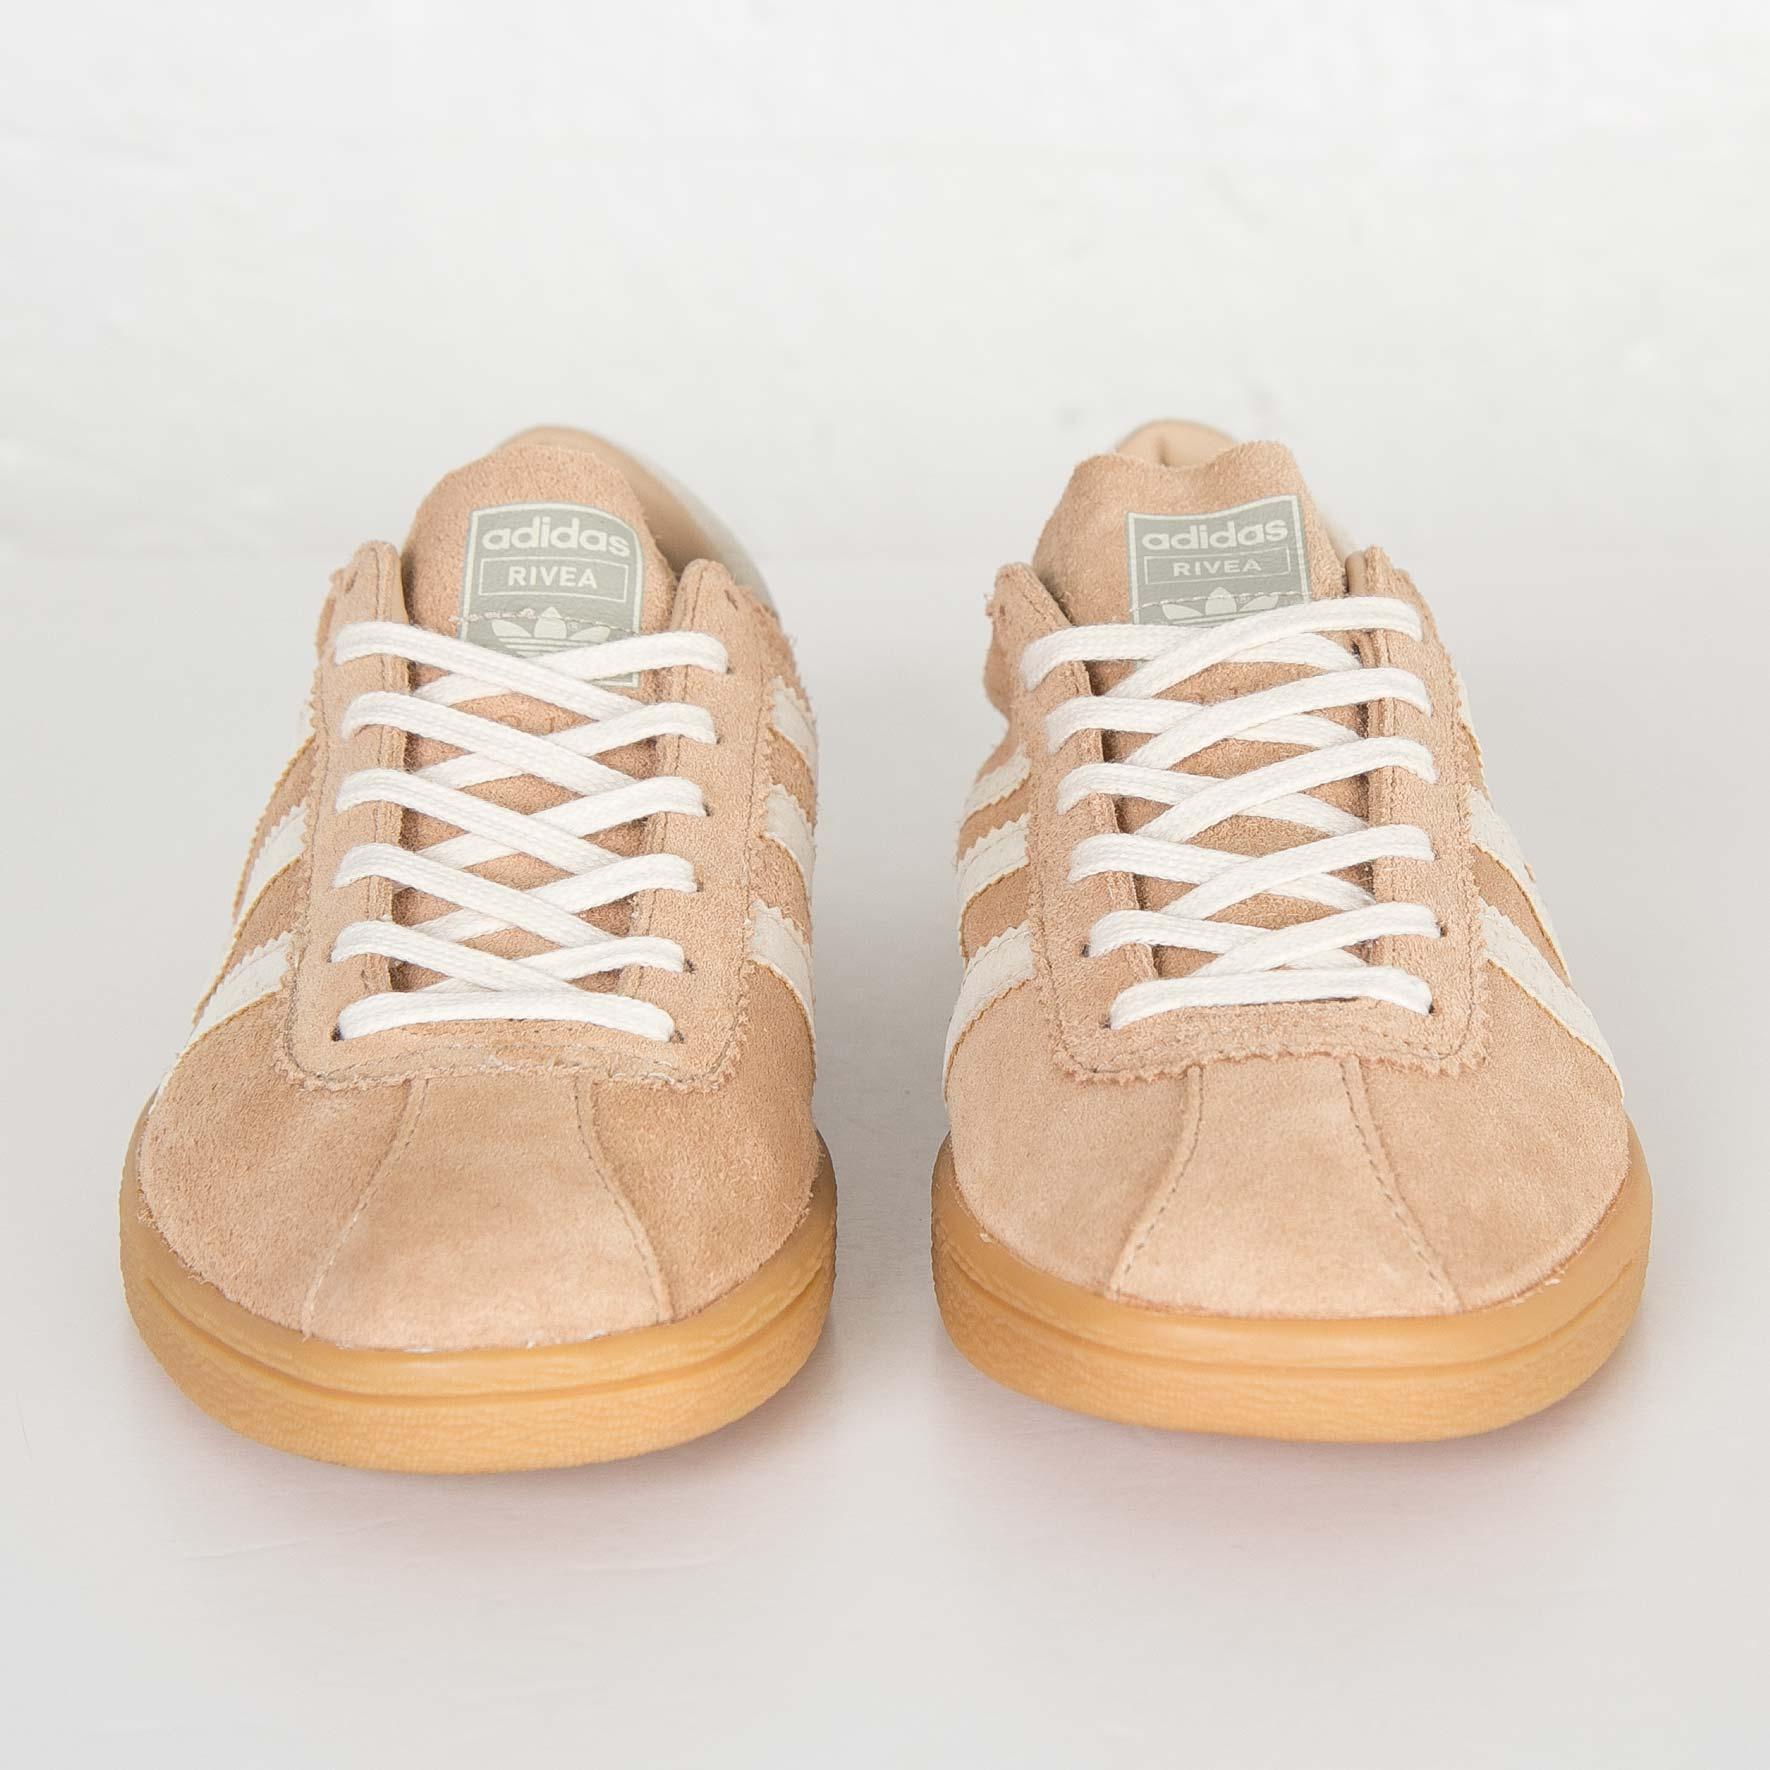 adidas Chaussures Tobacco Rivea adidas soldes  36 Caprice 24254 5mwUOf